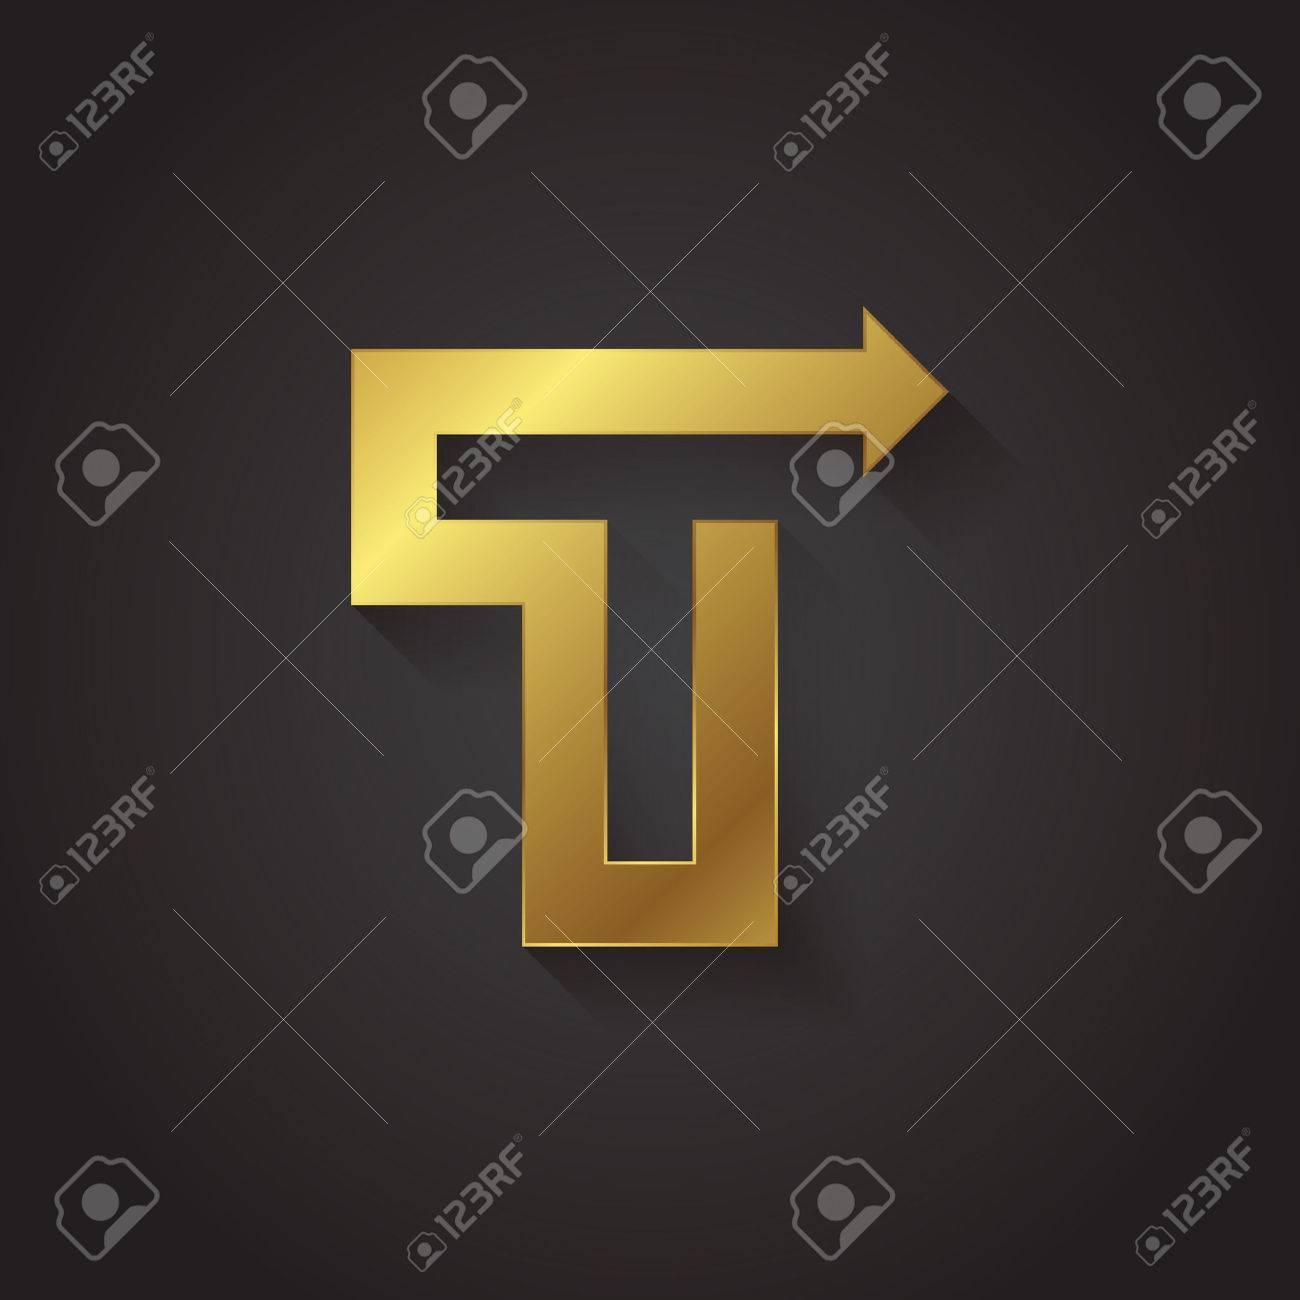 Vector Graphic Gold Arrow Alphabet Letter Symbol Letter T Royalty